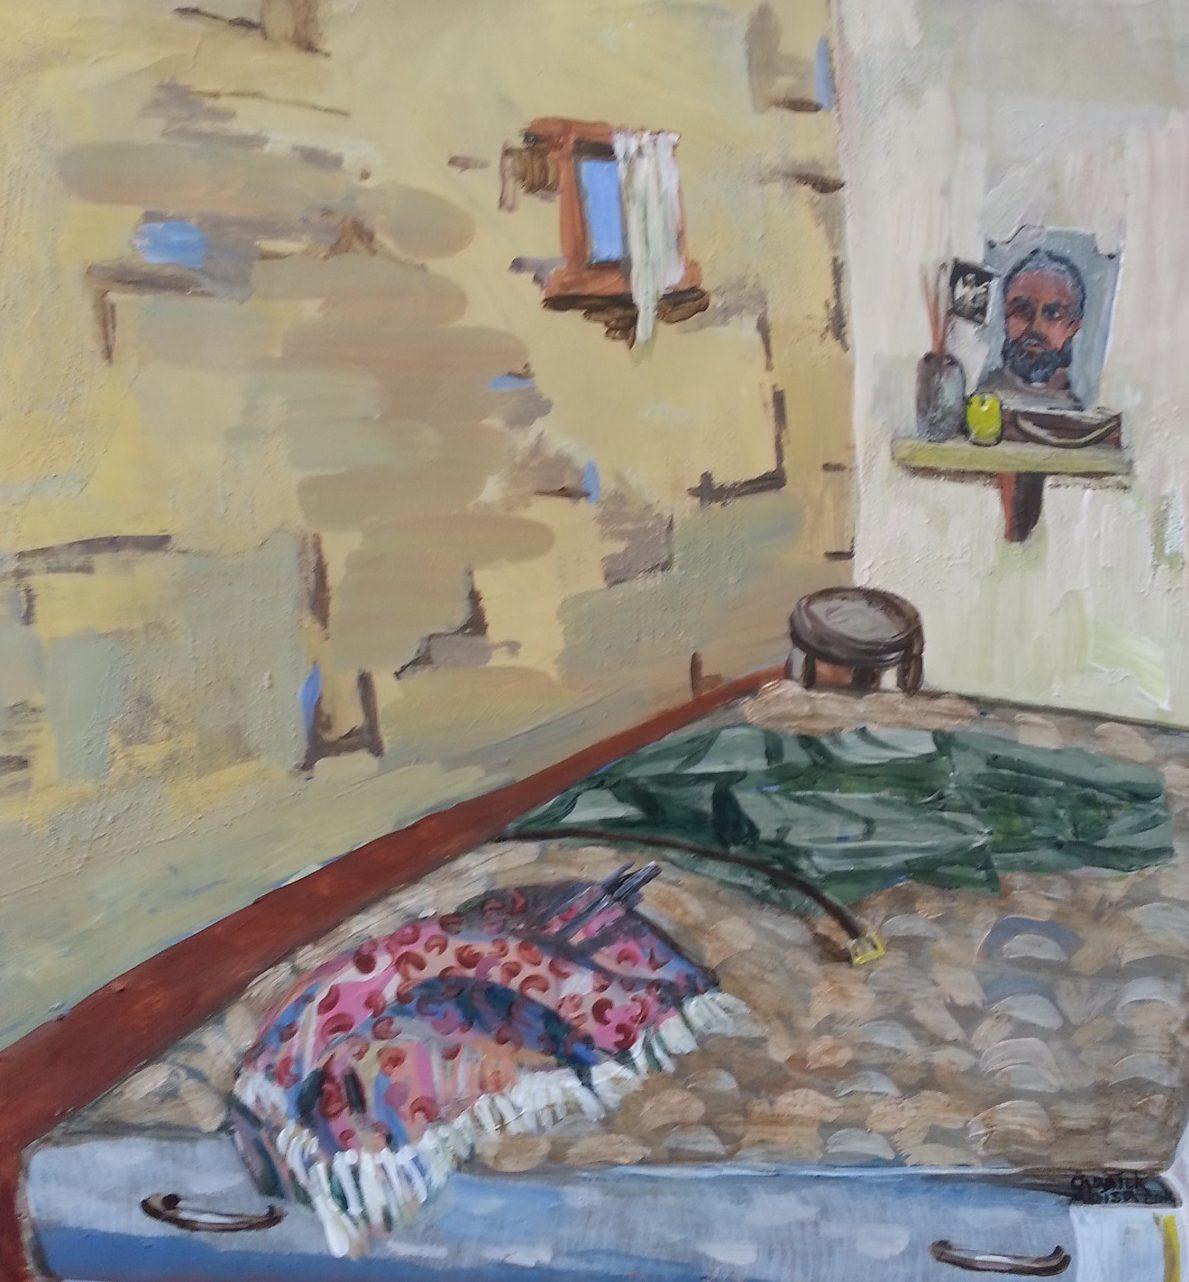 Pam Chadick Aloisa. Bedroom Shrine, Somalia. Acrylic on paper.